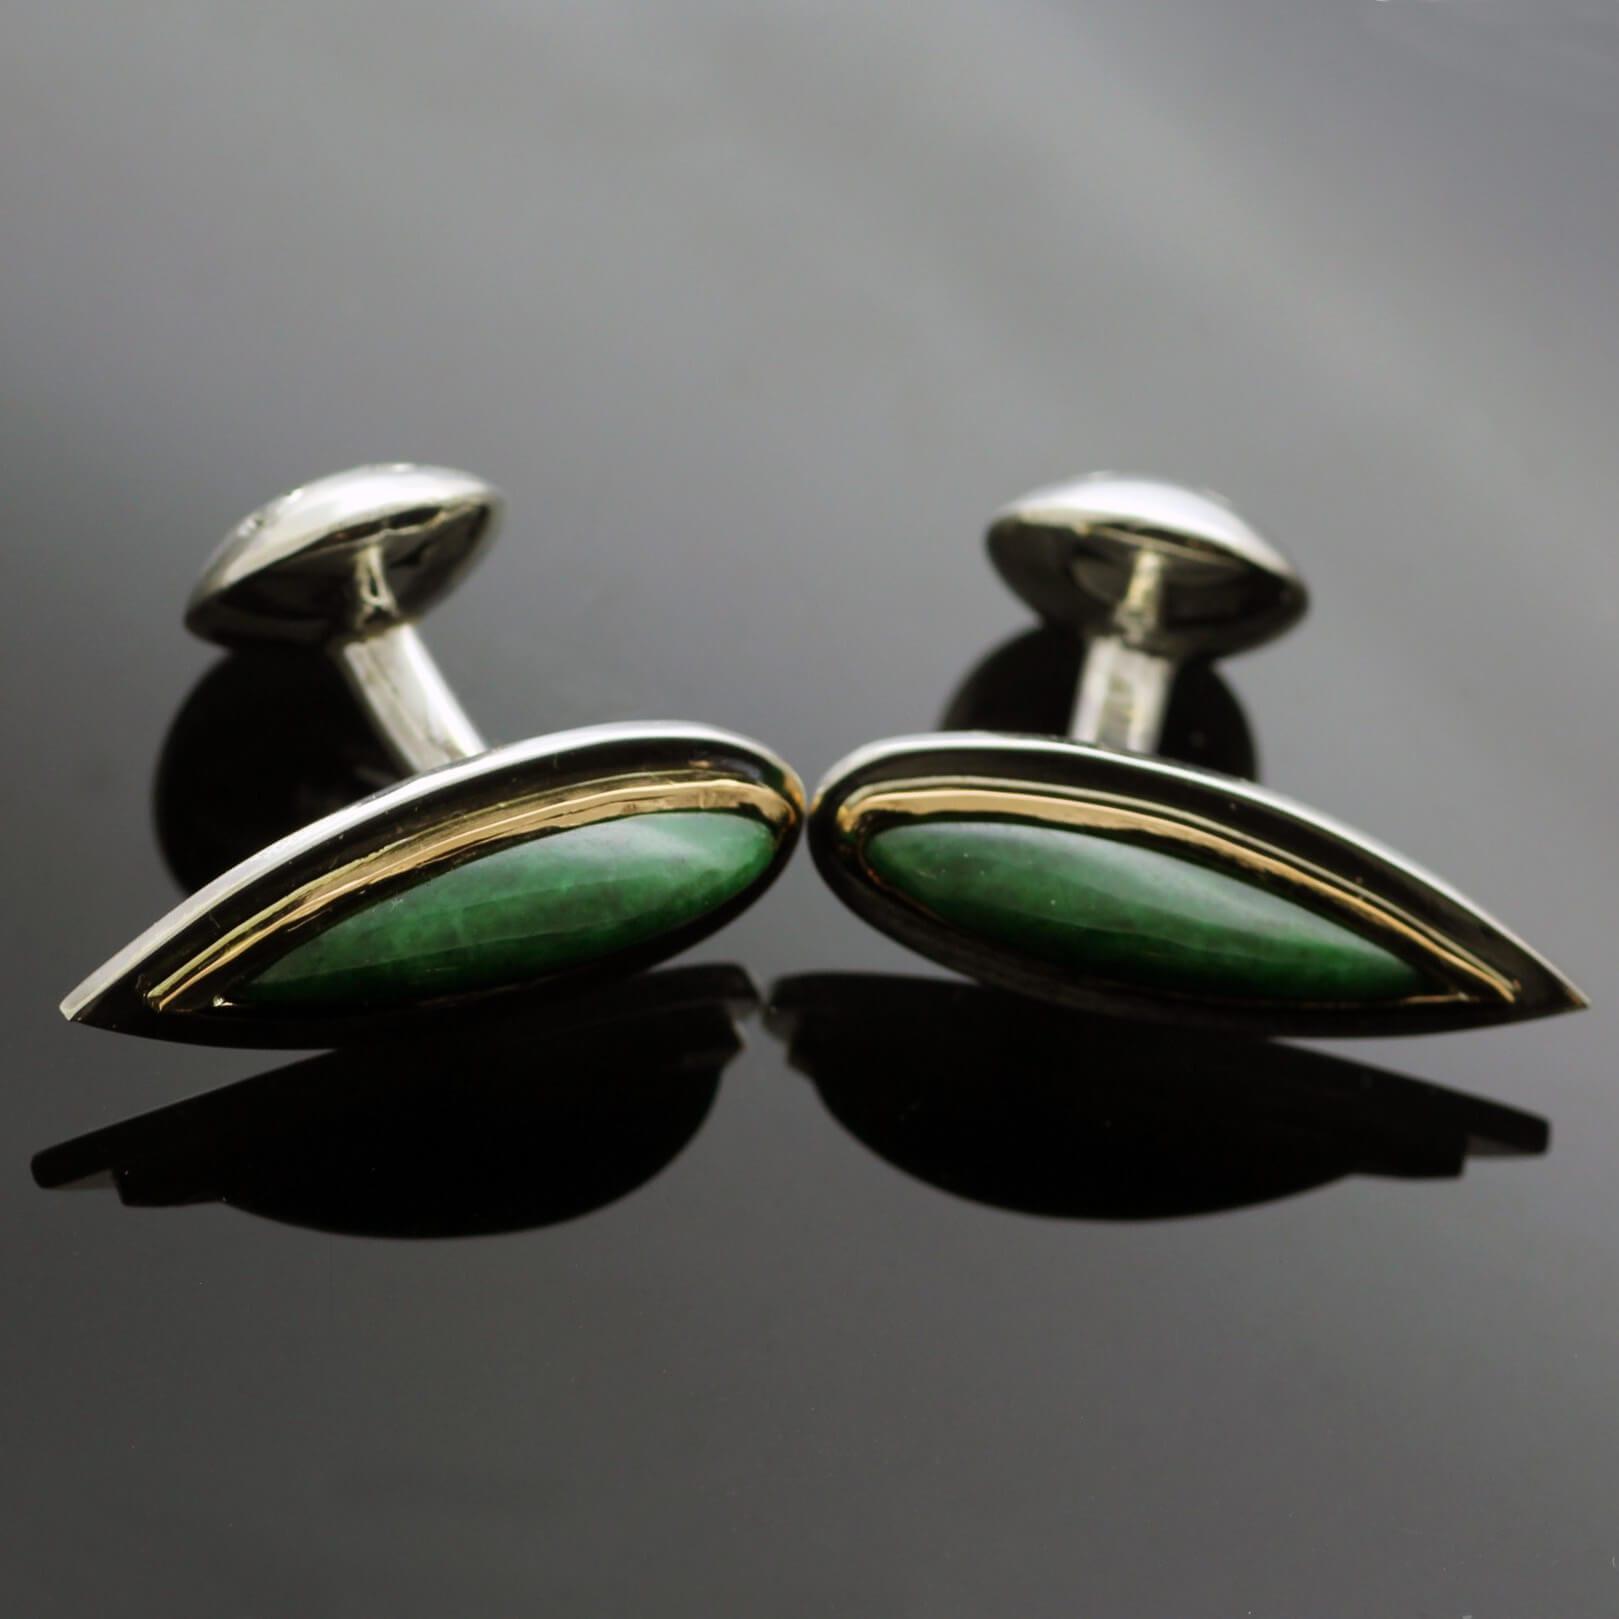 Jade Yellow Gold modern handcrafted cufflinks